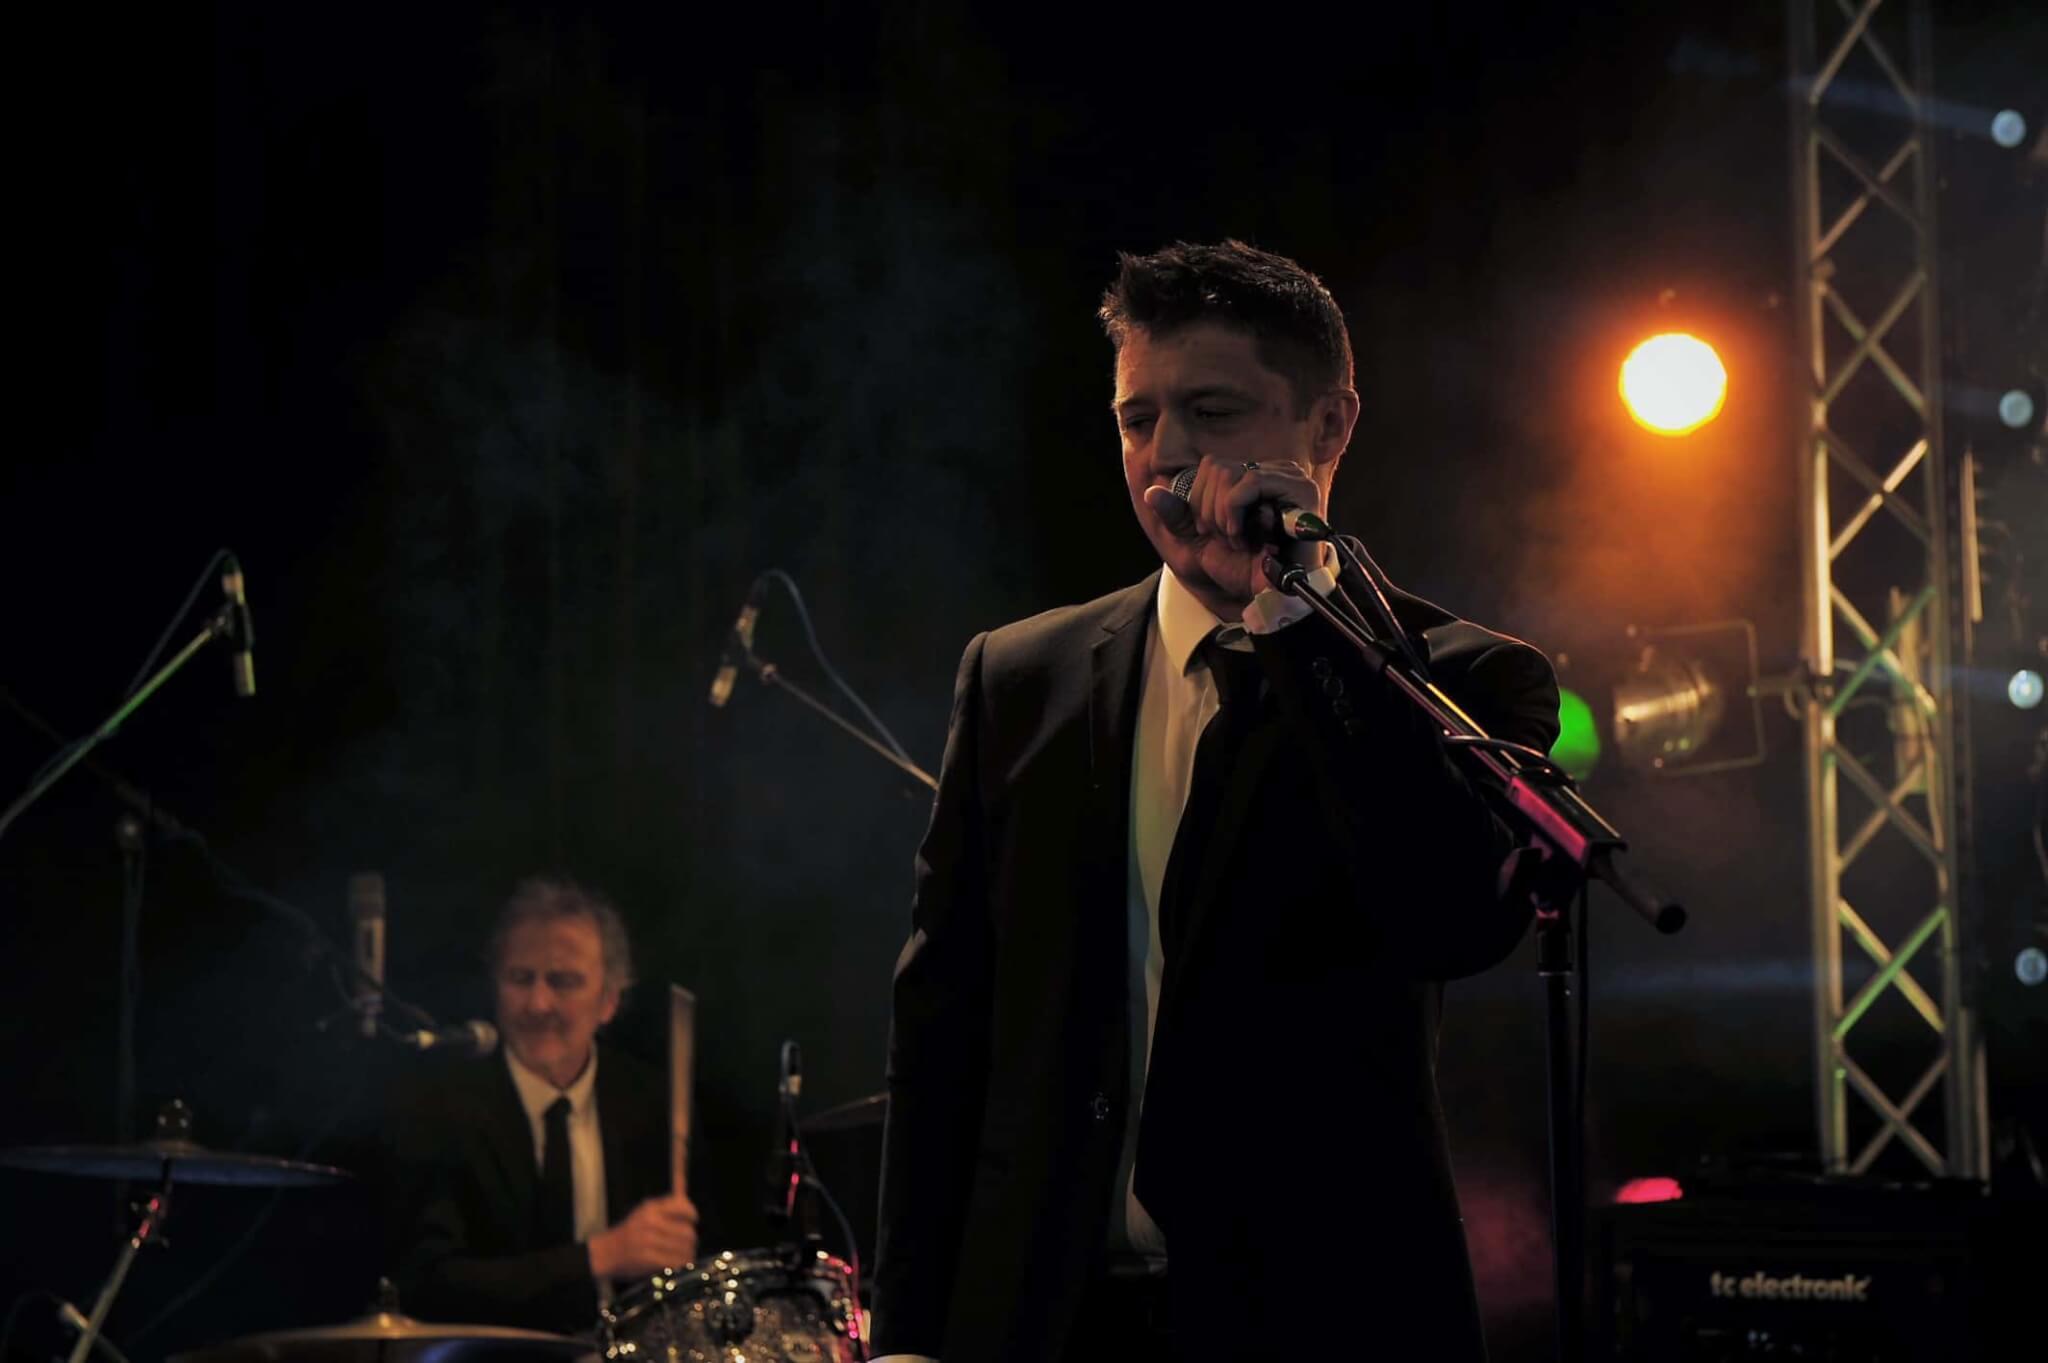 Tom's Band